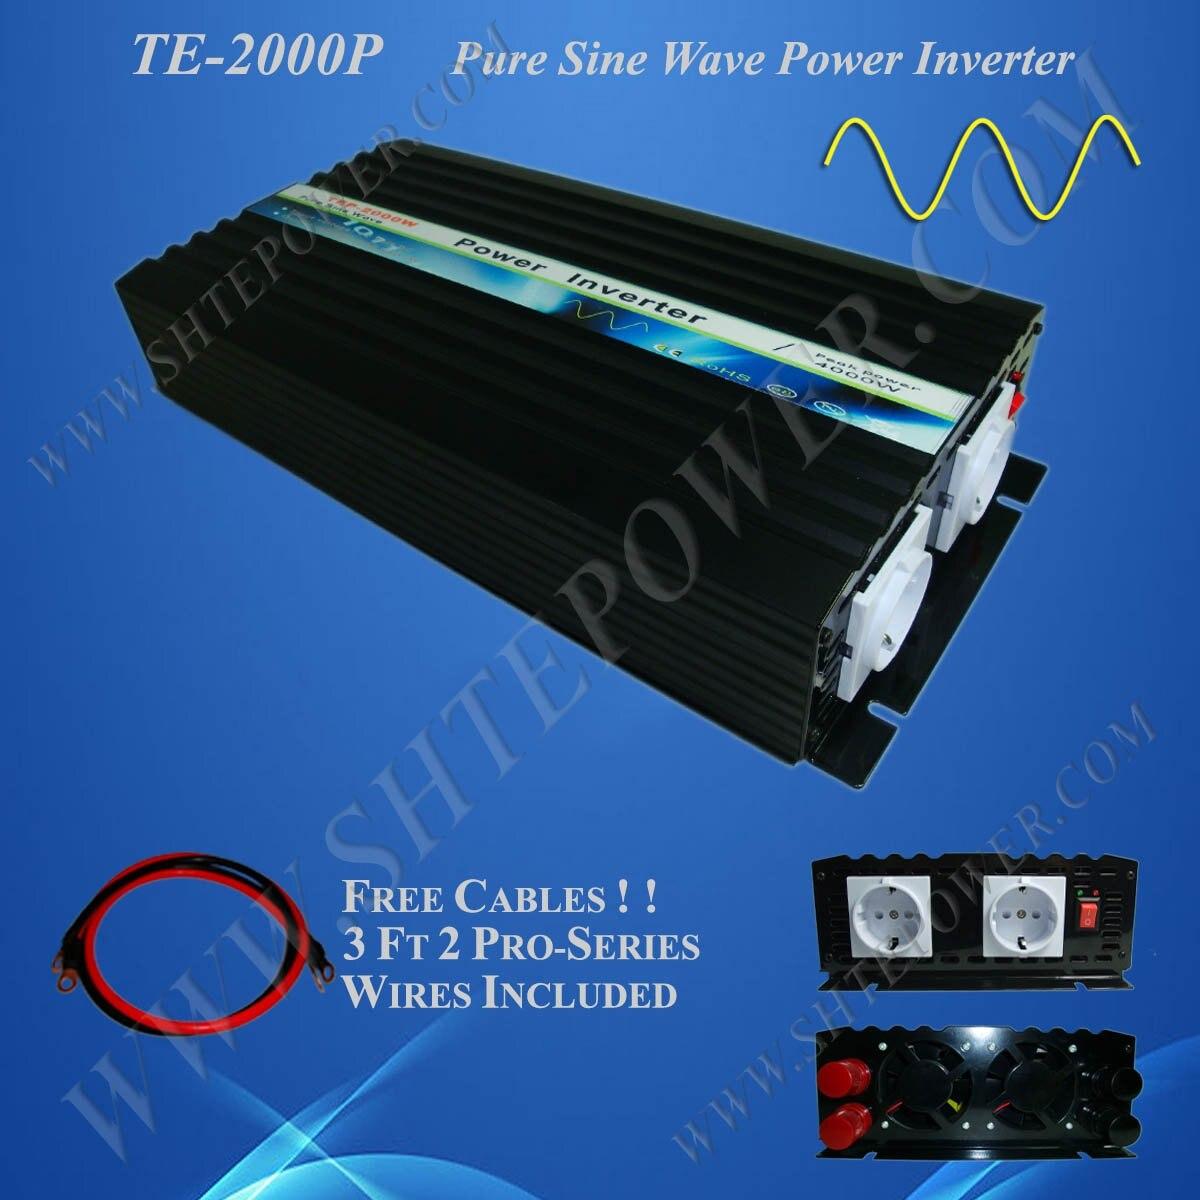 2000W Pure Sine Wave Power Inverter DC 72v to AC 100v2000W Pure Sine Wave Power Inverter DC 72v to AC 100v